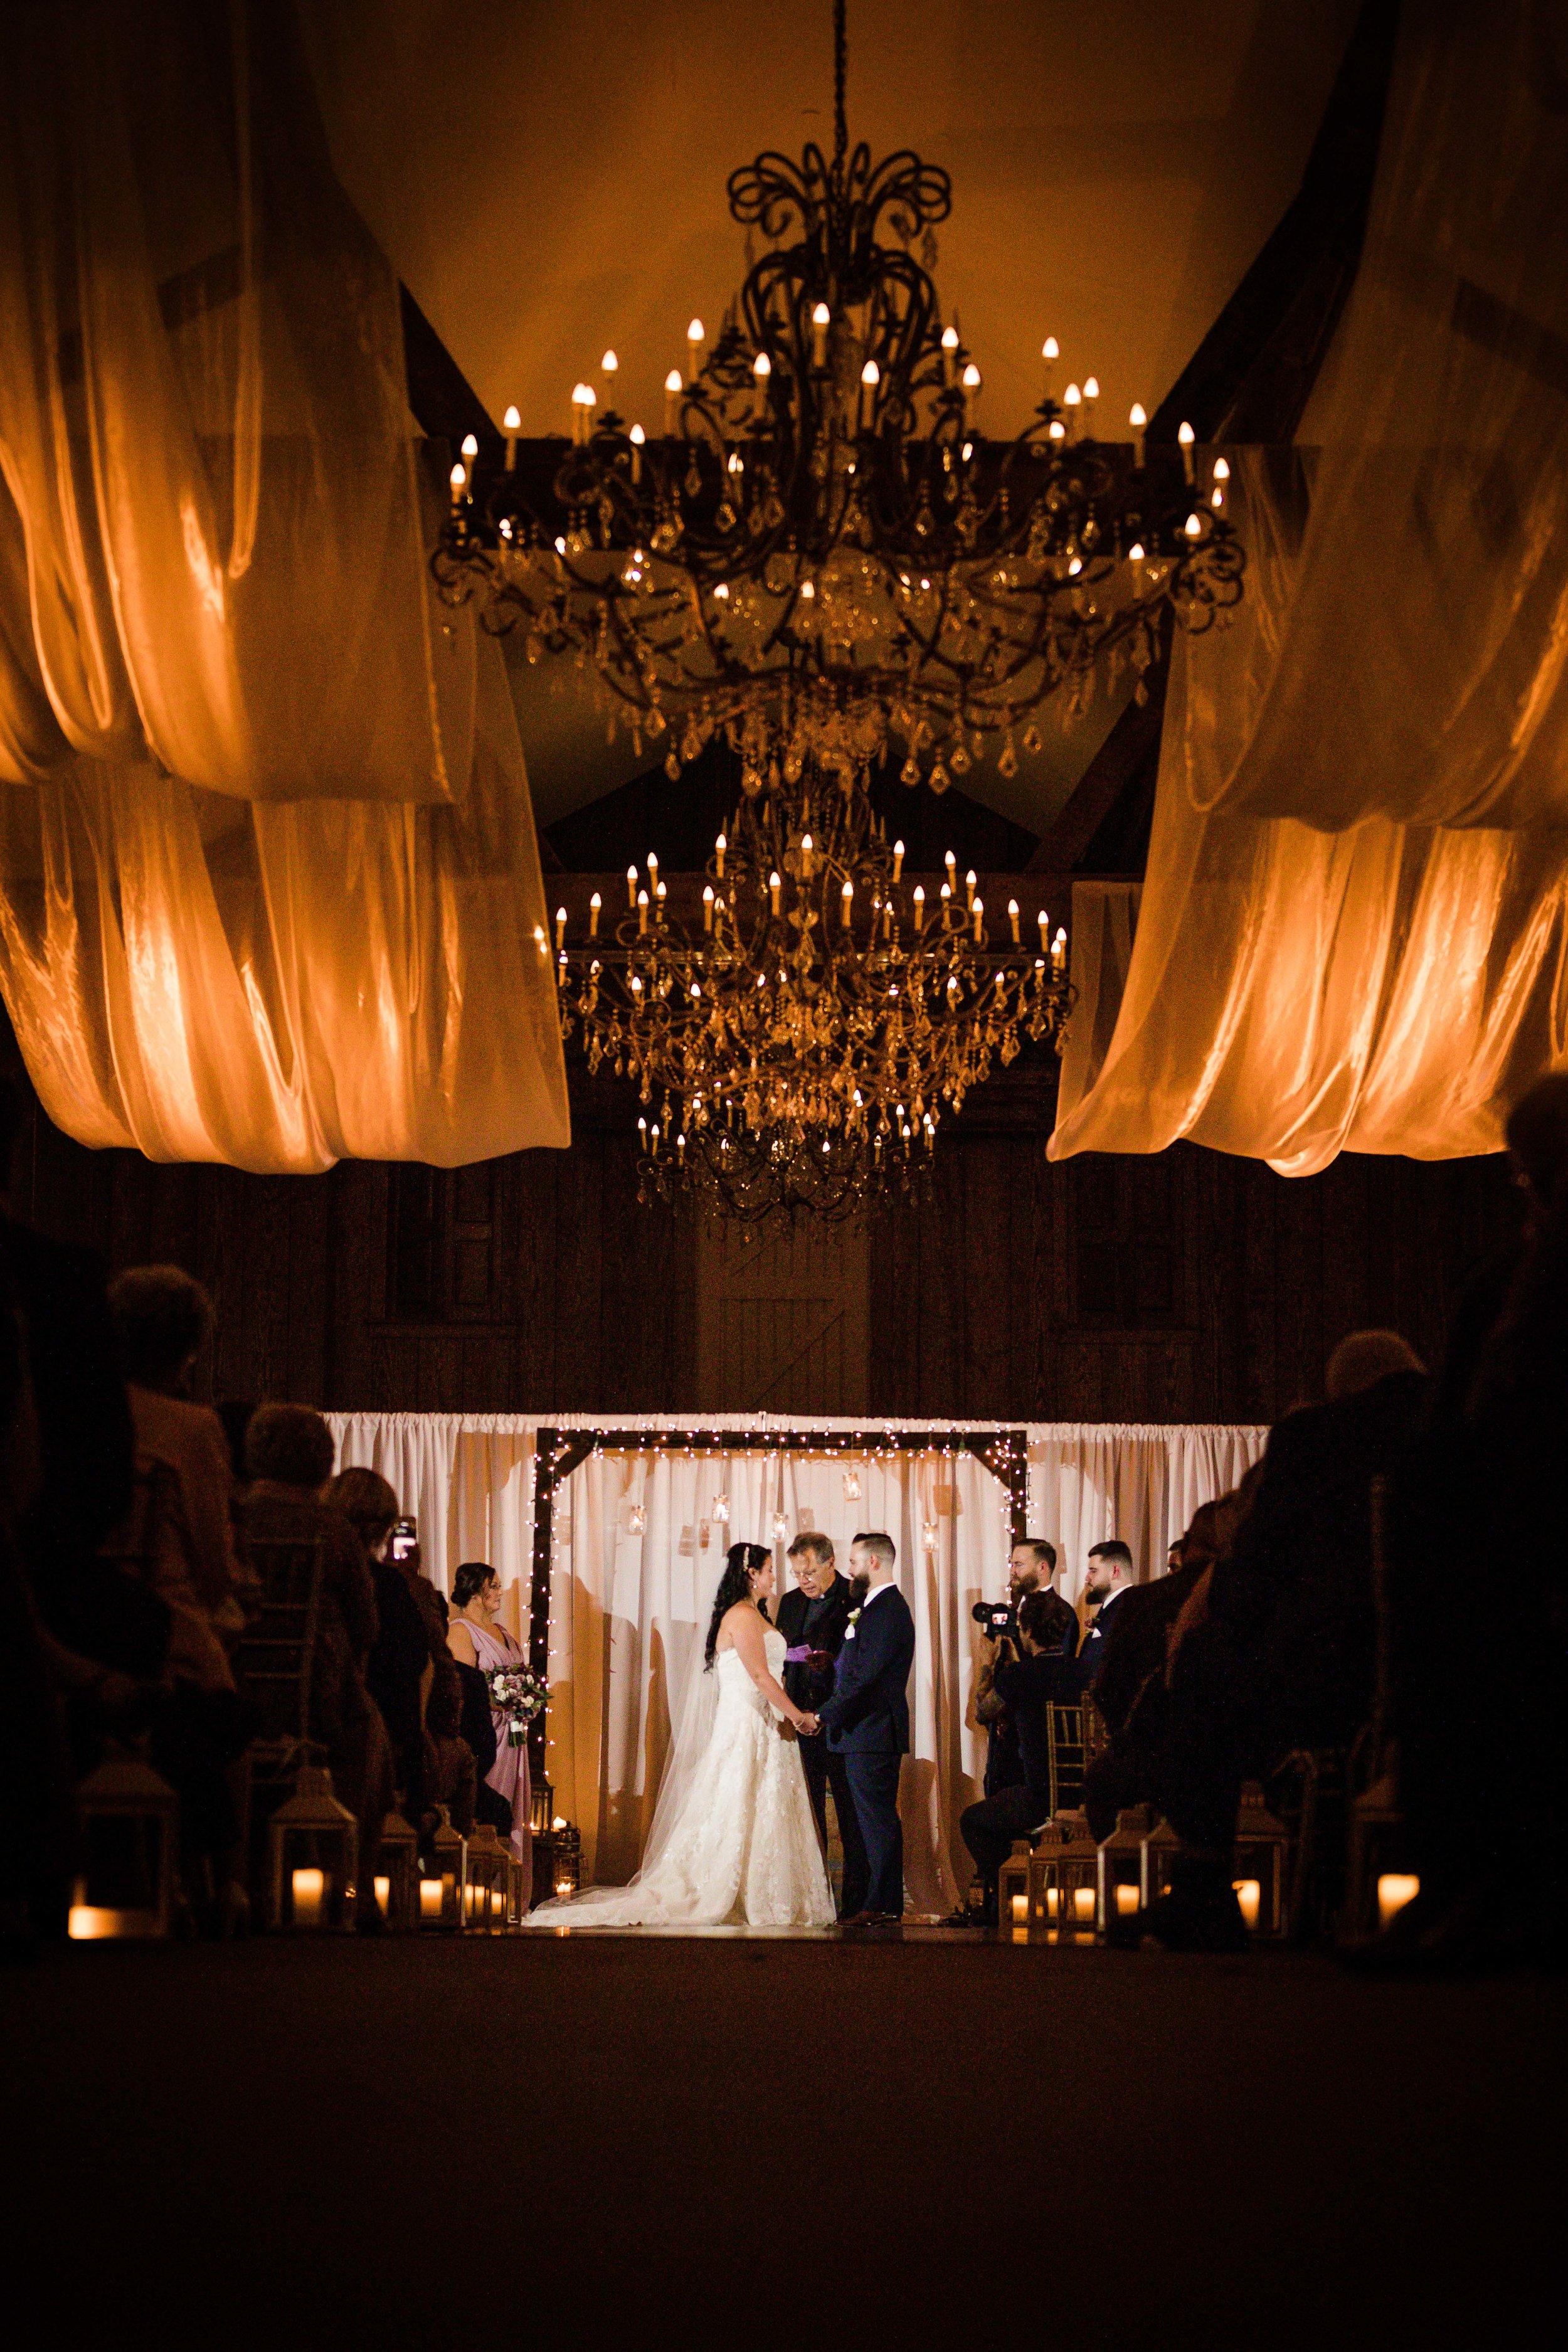 Diana and Henry - Normandy Farms Wedding Photography - Estras-107.jpg